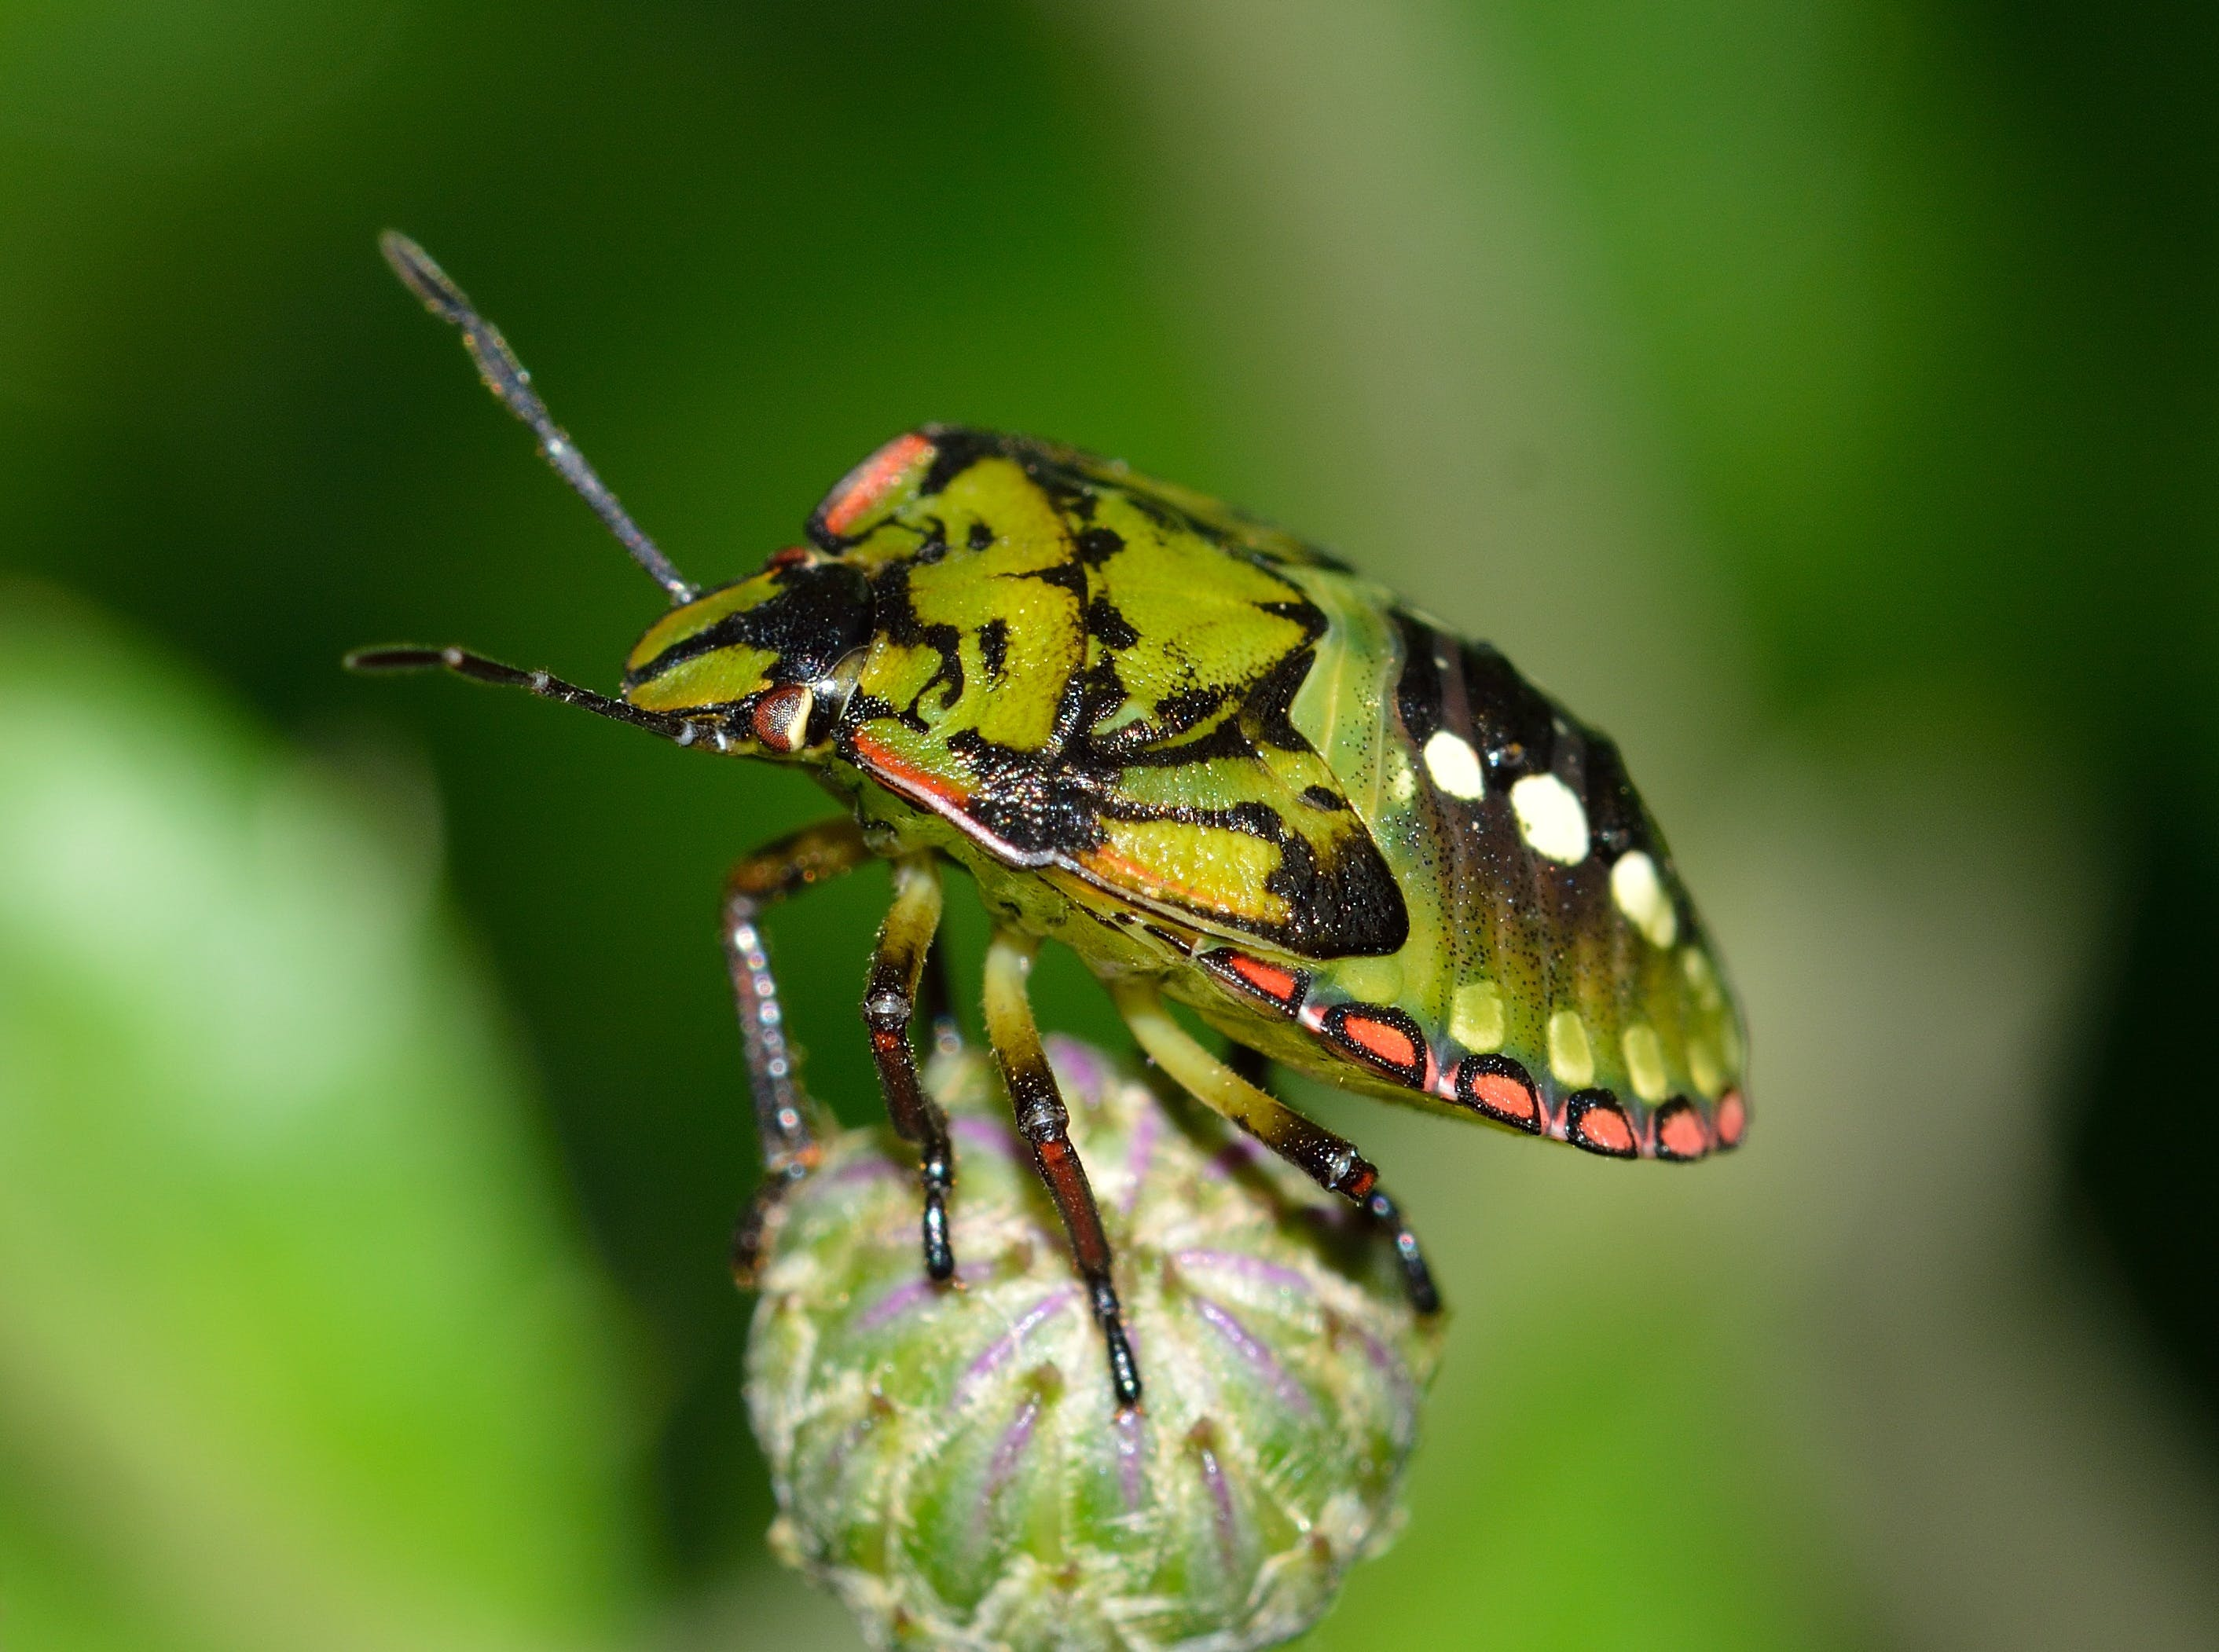 Green and Black Shield Bug